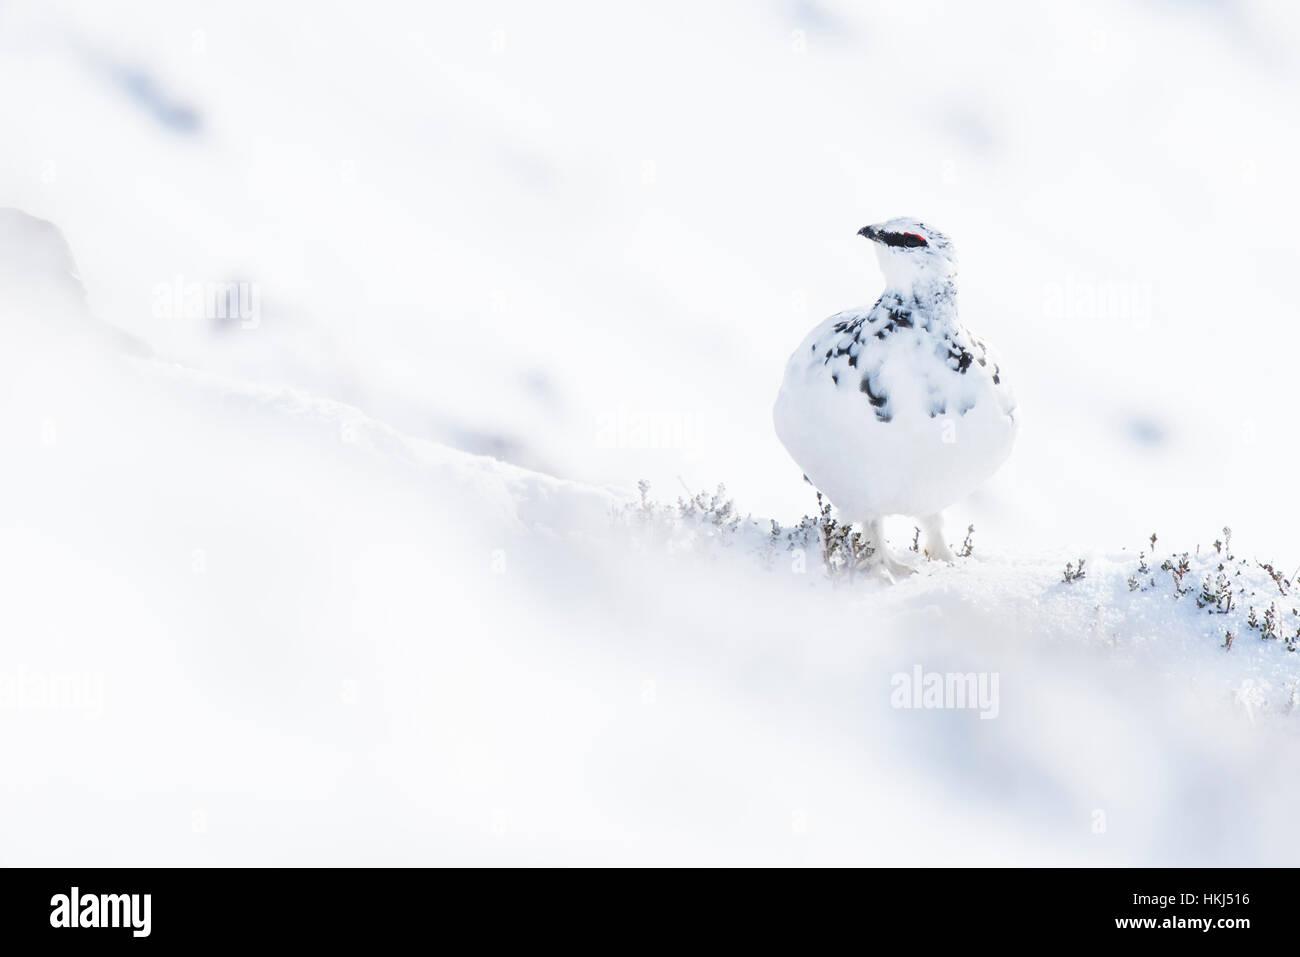 Rock ptarmigan (Lagopus muta) in the snow, Cairngorms National Park, Scottish Highlands, Scotland, United Kingdom - Stock Image